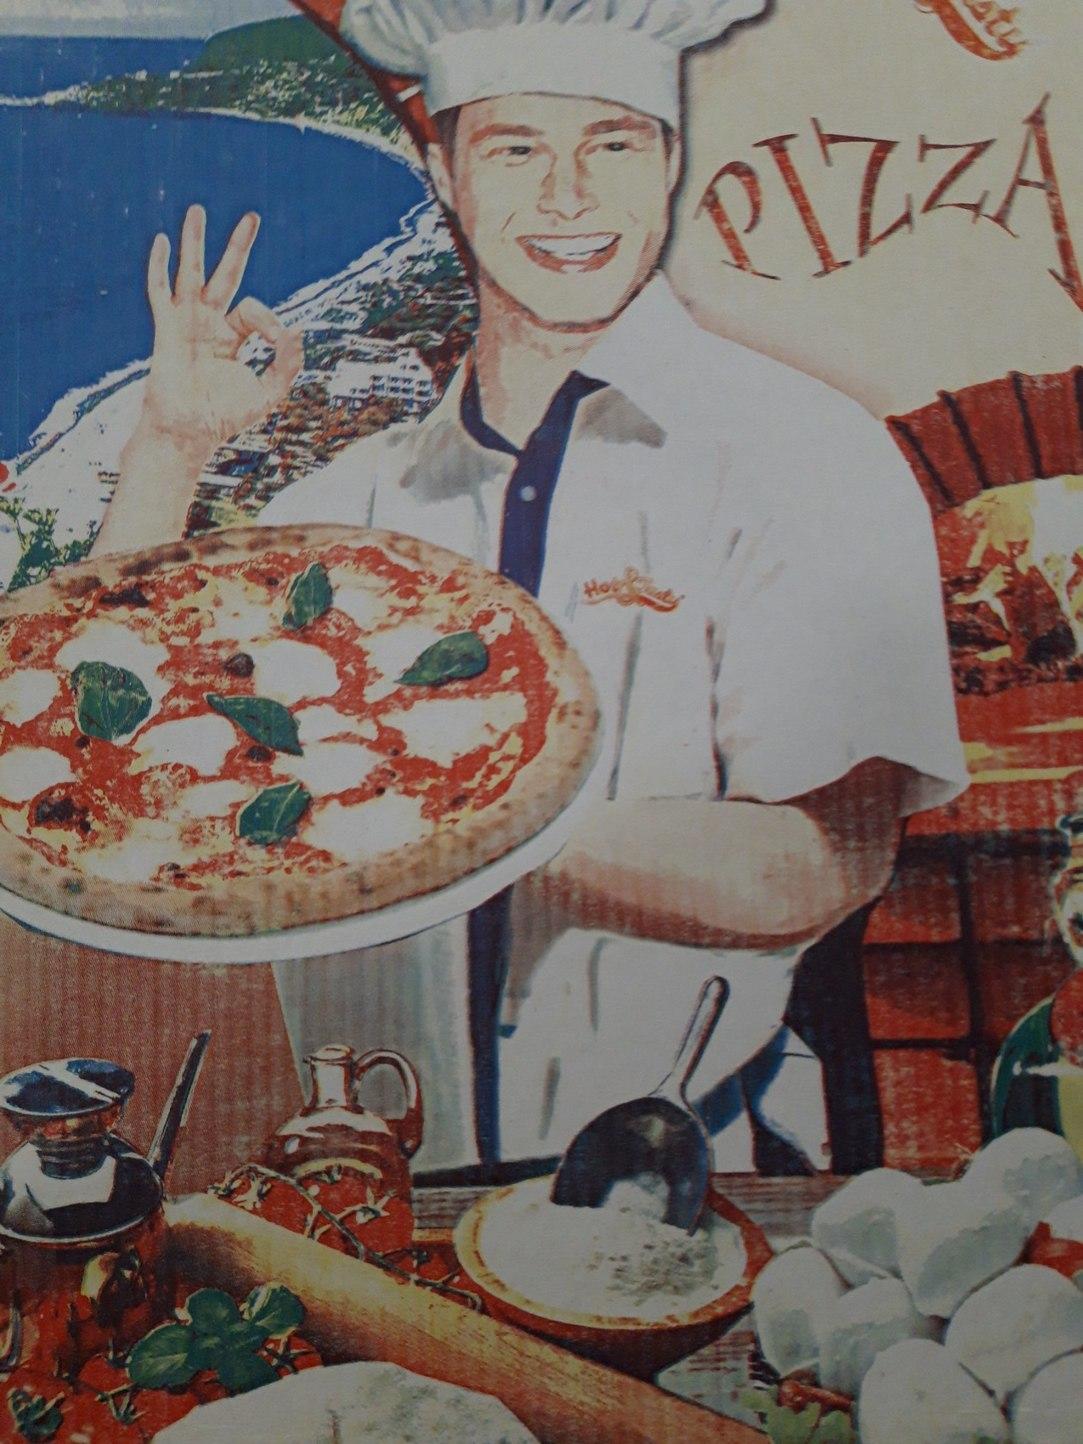 Plantilla de pizza - meme